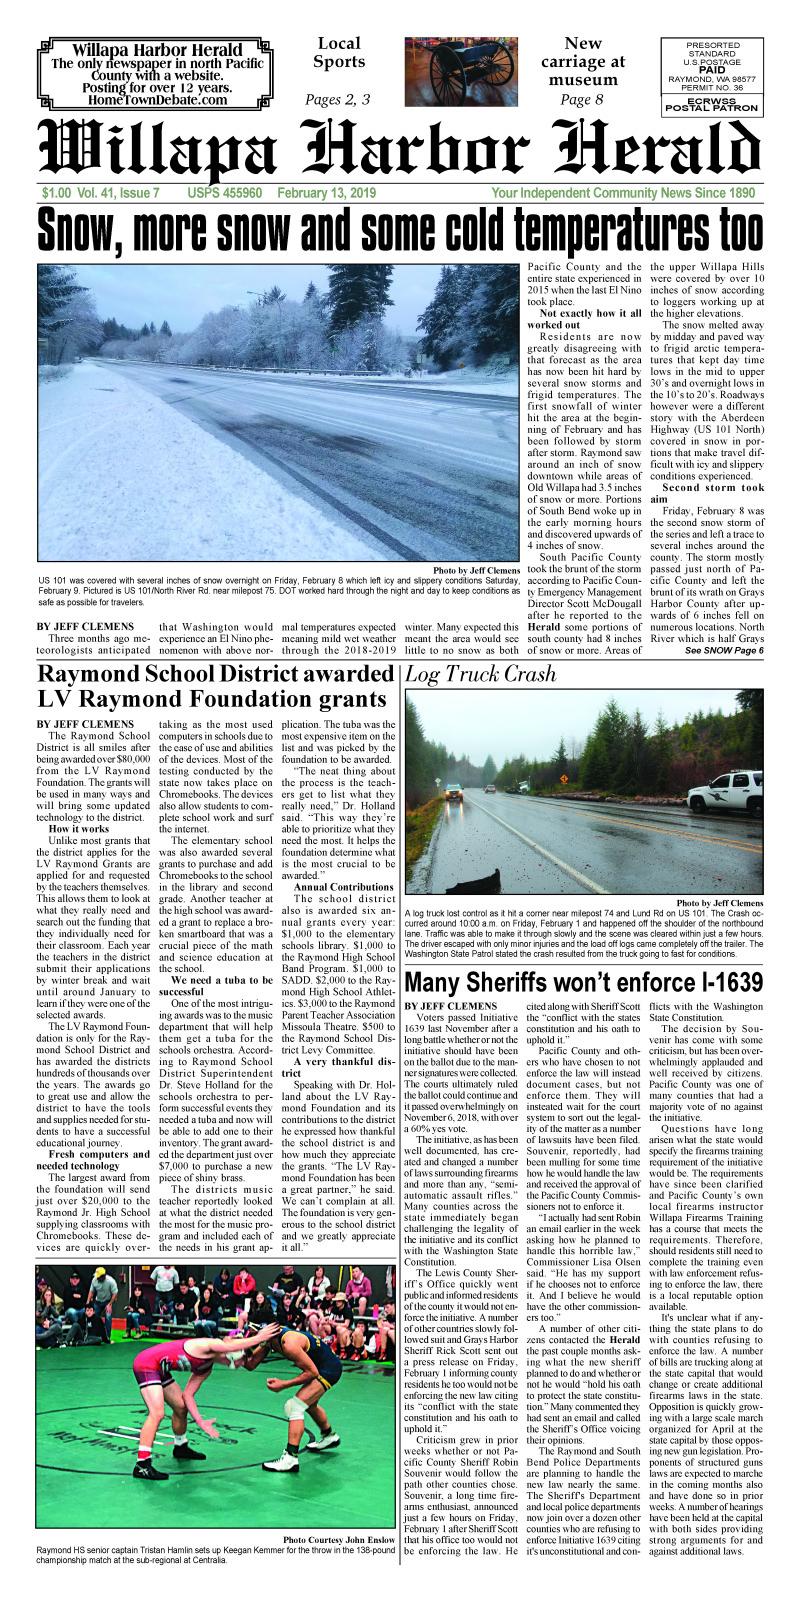 February 13, 2019 Willapa Harbor Herald